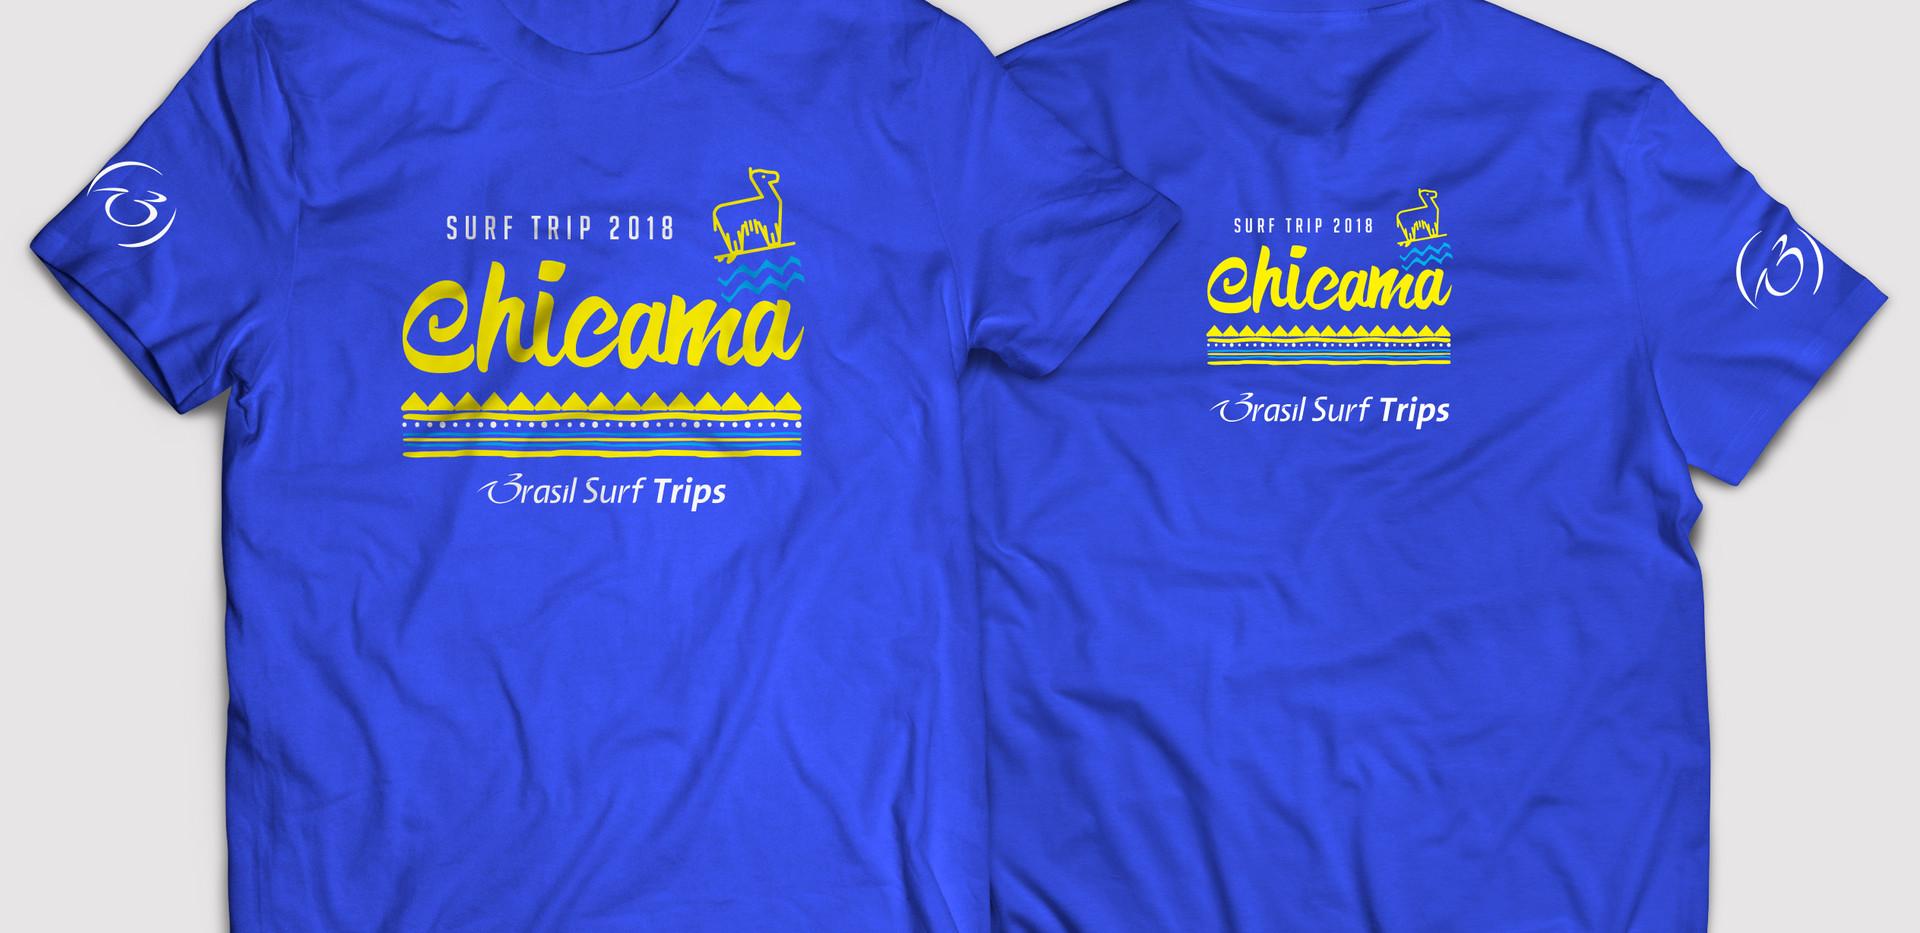 Camiseta Surf Trip Chicama